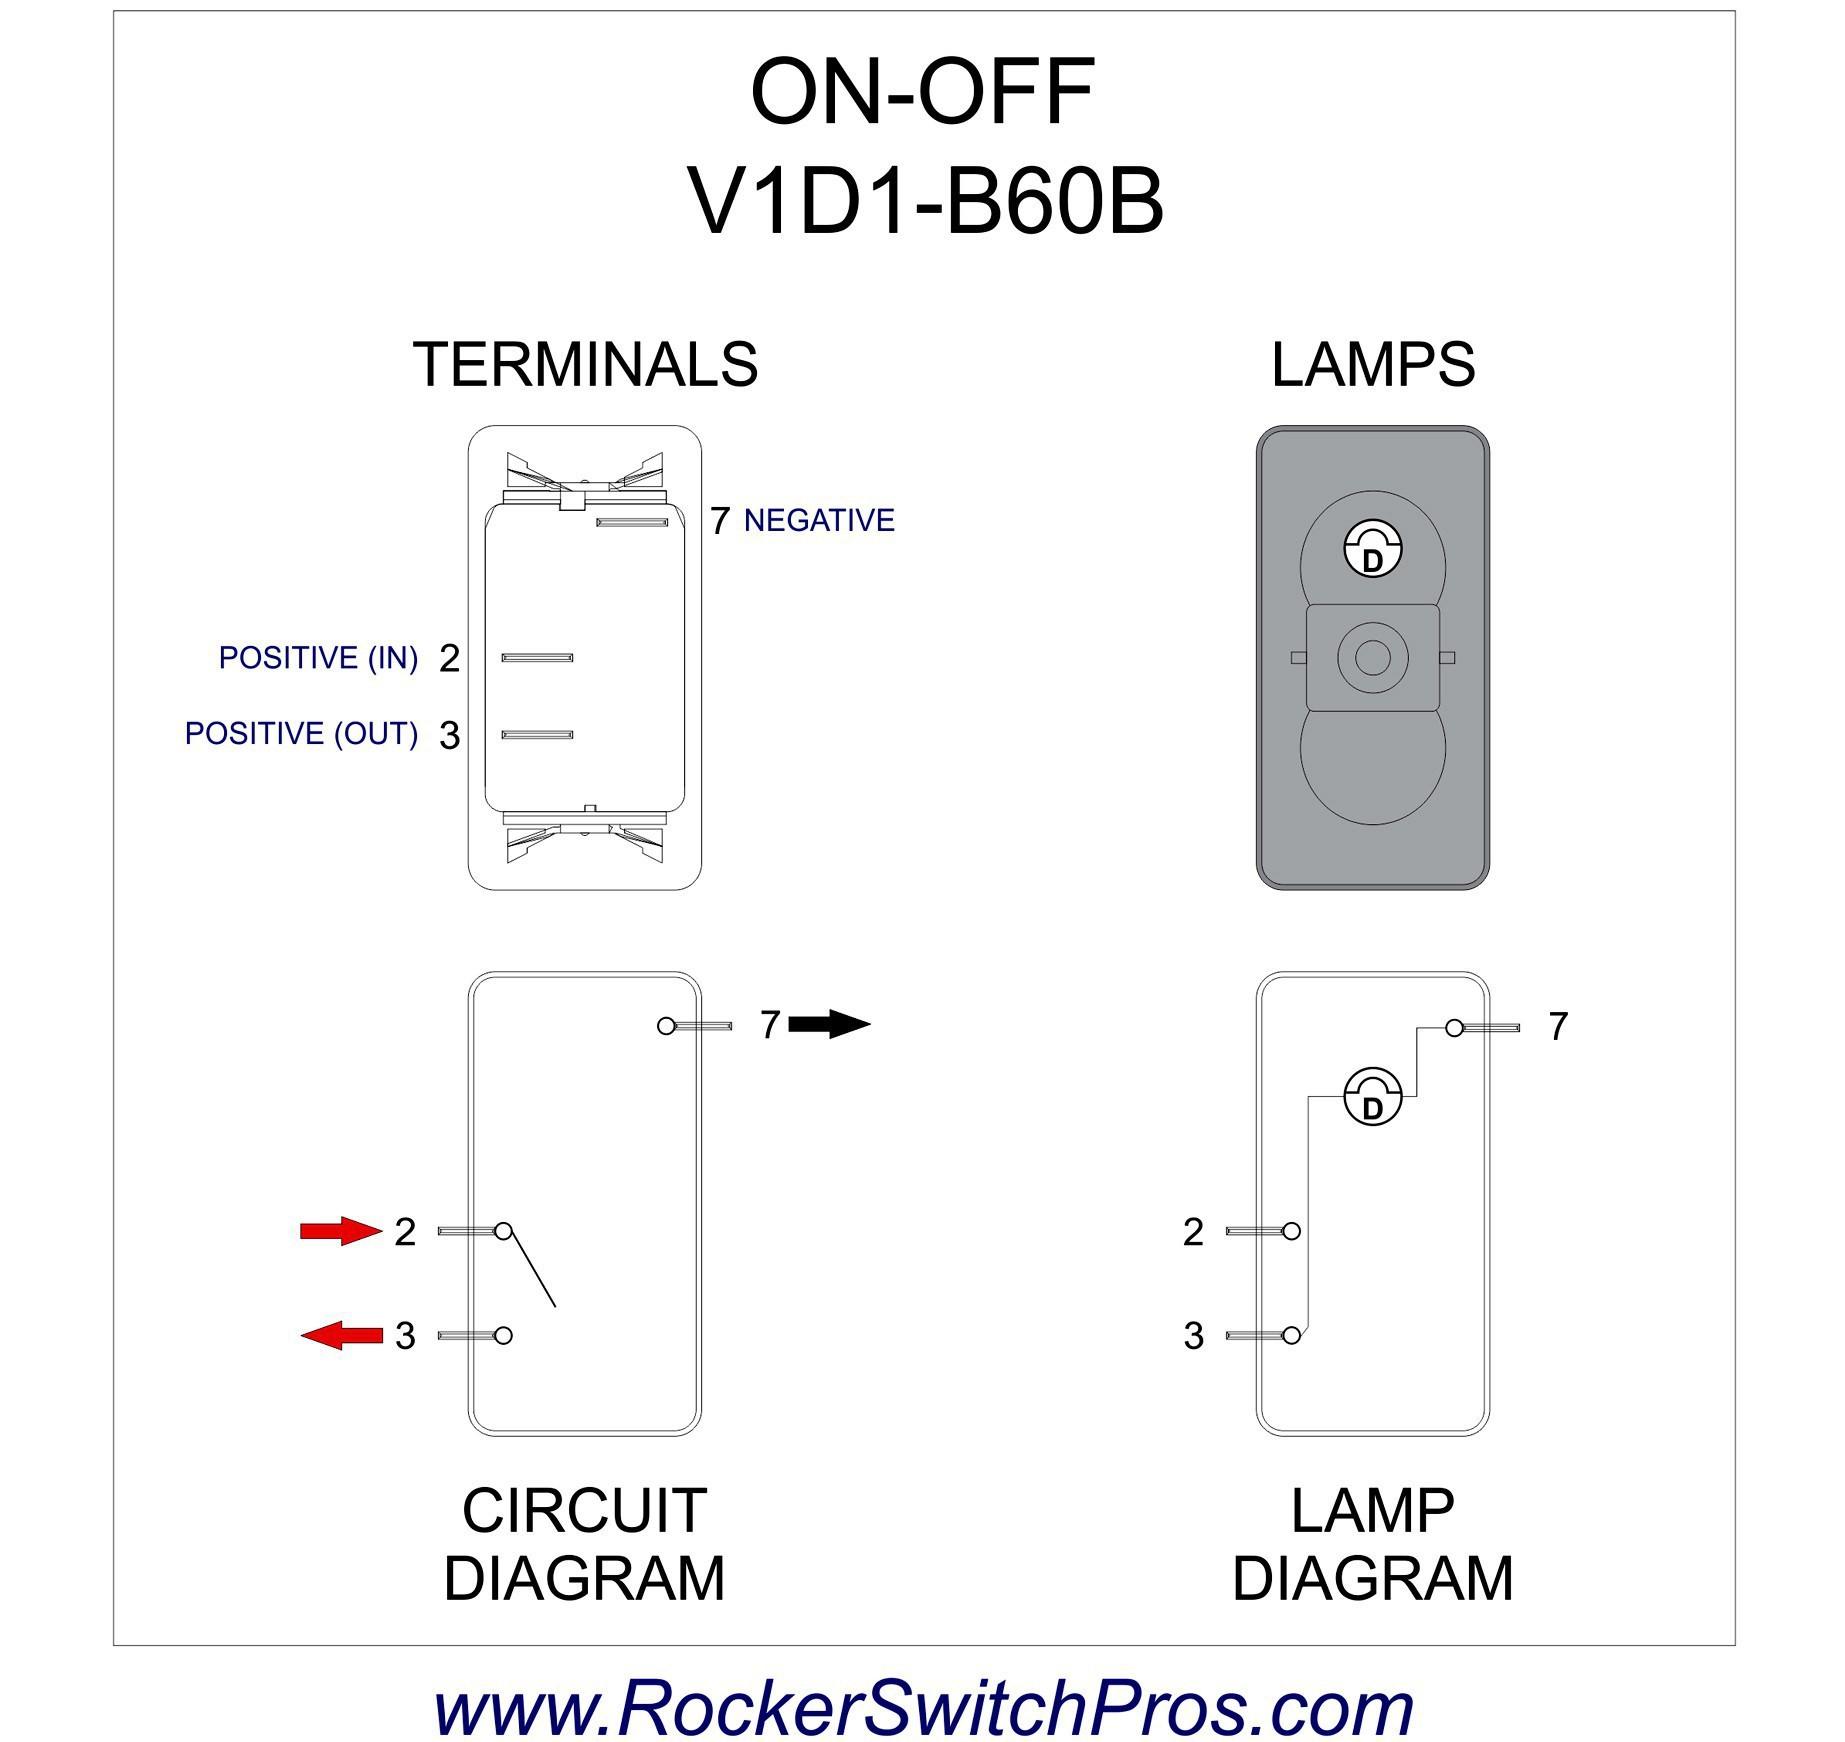 rugged ridge rocker switch wiring diagram wiring diagram HVAC Wiring Diagrams rugged ridge switch wiring diagram wiring library